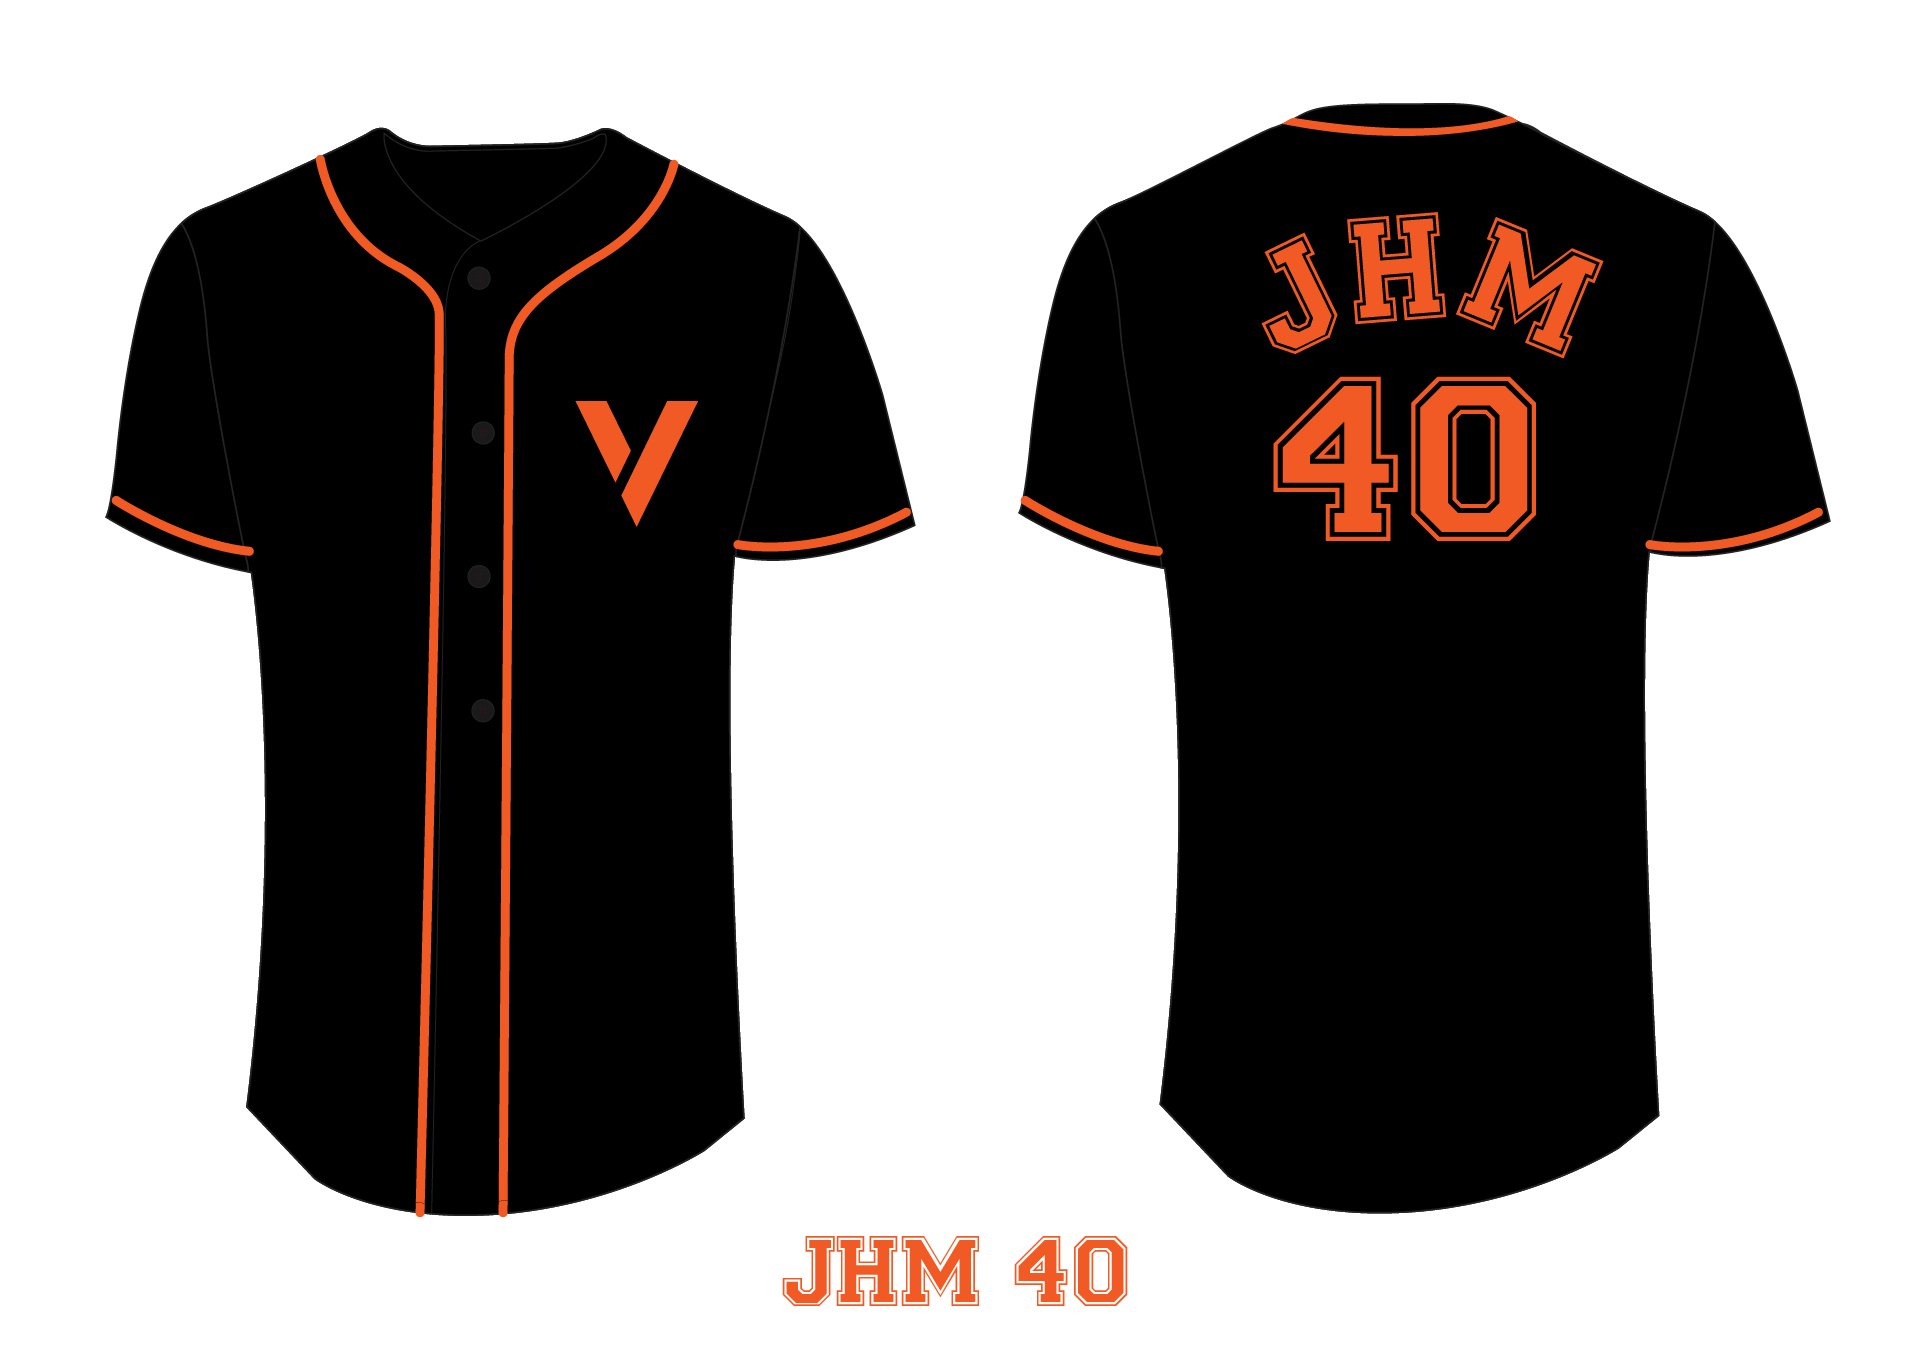 Jersey_Valley_JHM_40.jpg